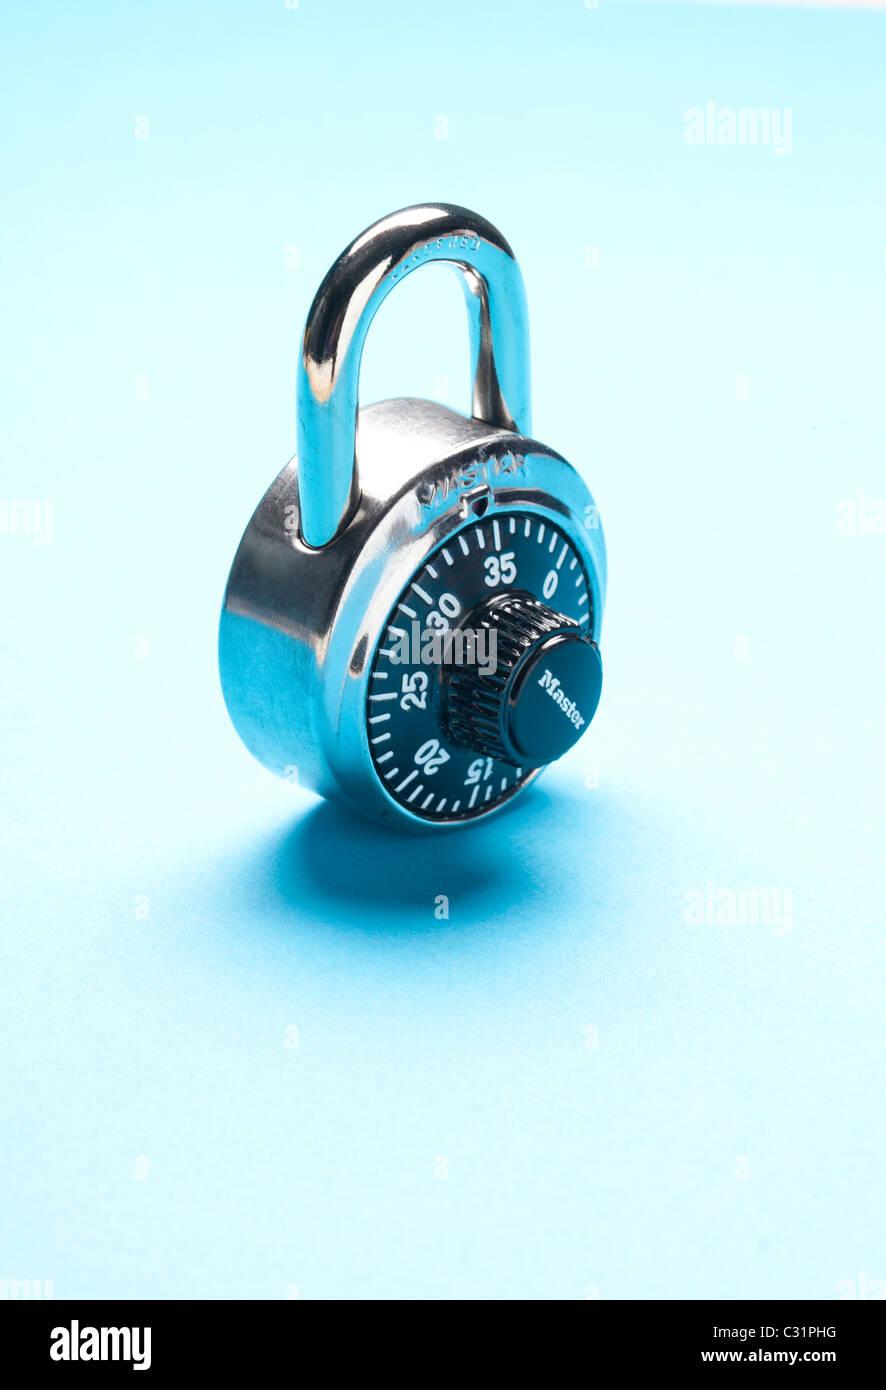 pad lock - Stock Image